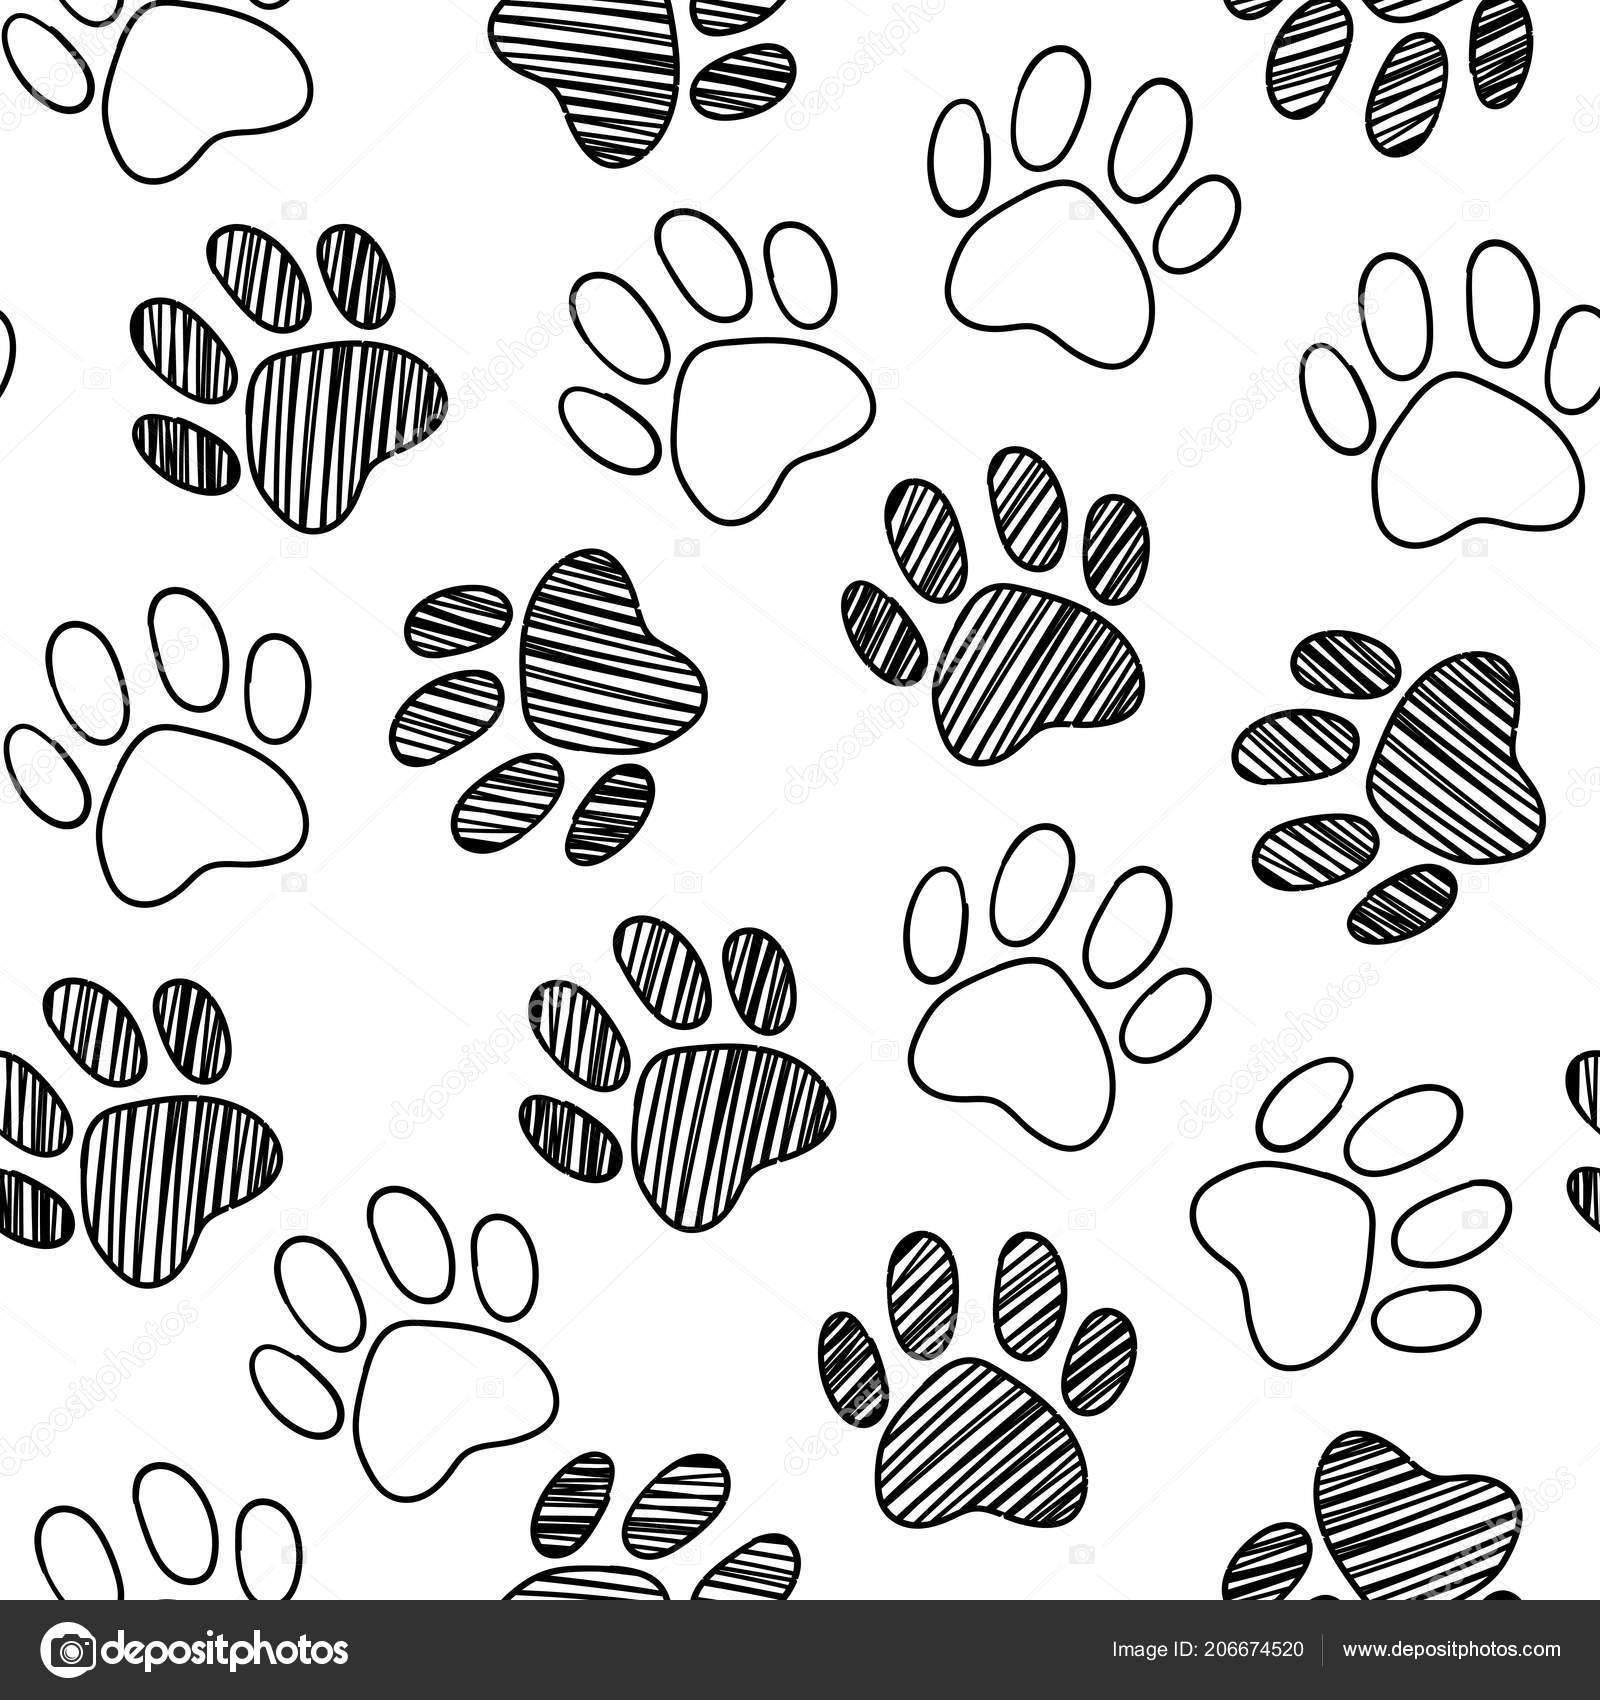 Monochrome Black White Dog Cat Pet Animal Paw Foot Hand Stock